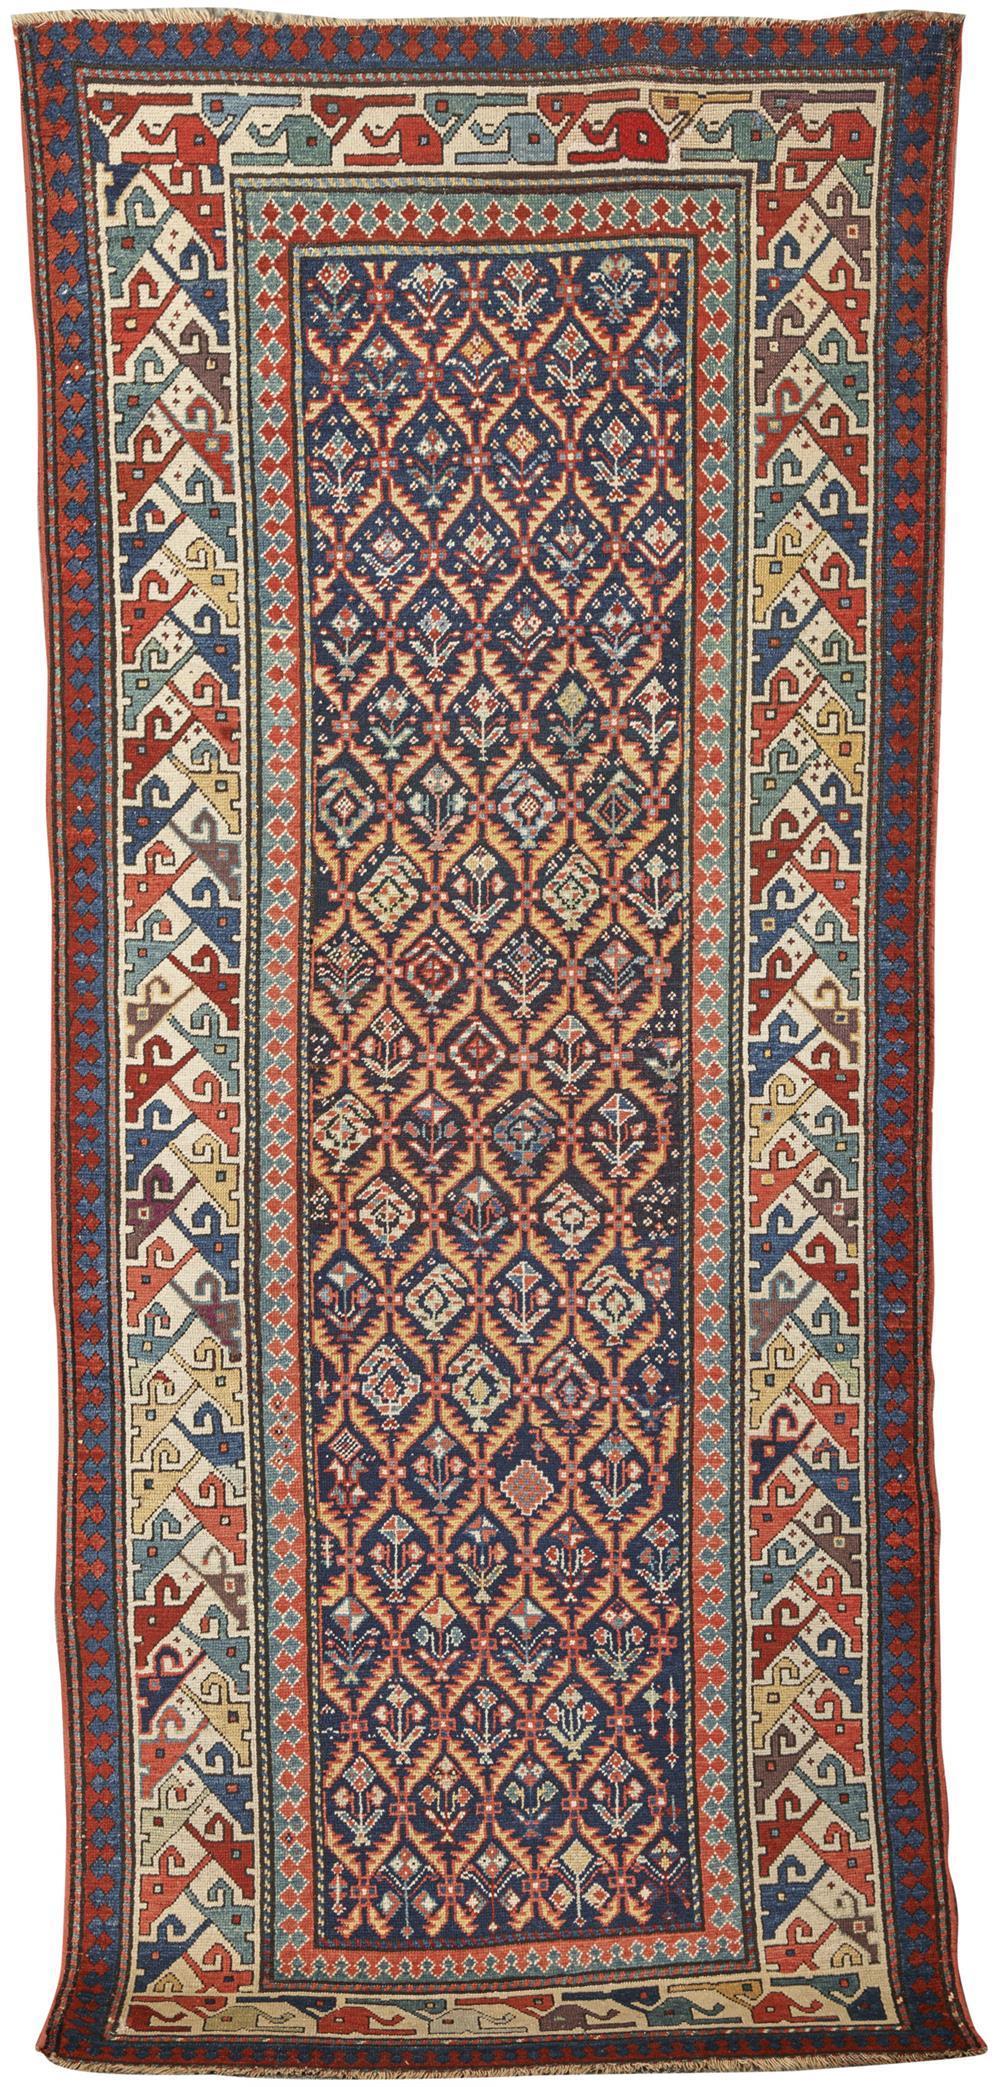 Caucasian Long Rug, ca. 1910; 8 ft. 10 in. x 3 ft. 9 in.